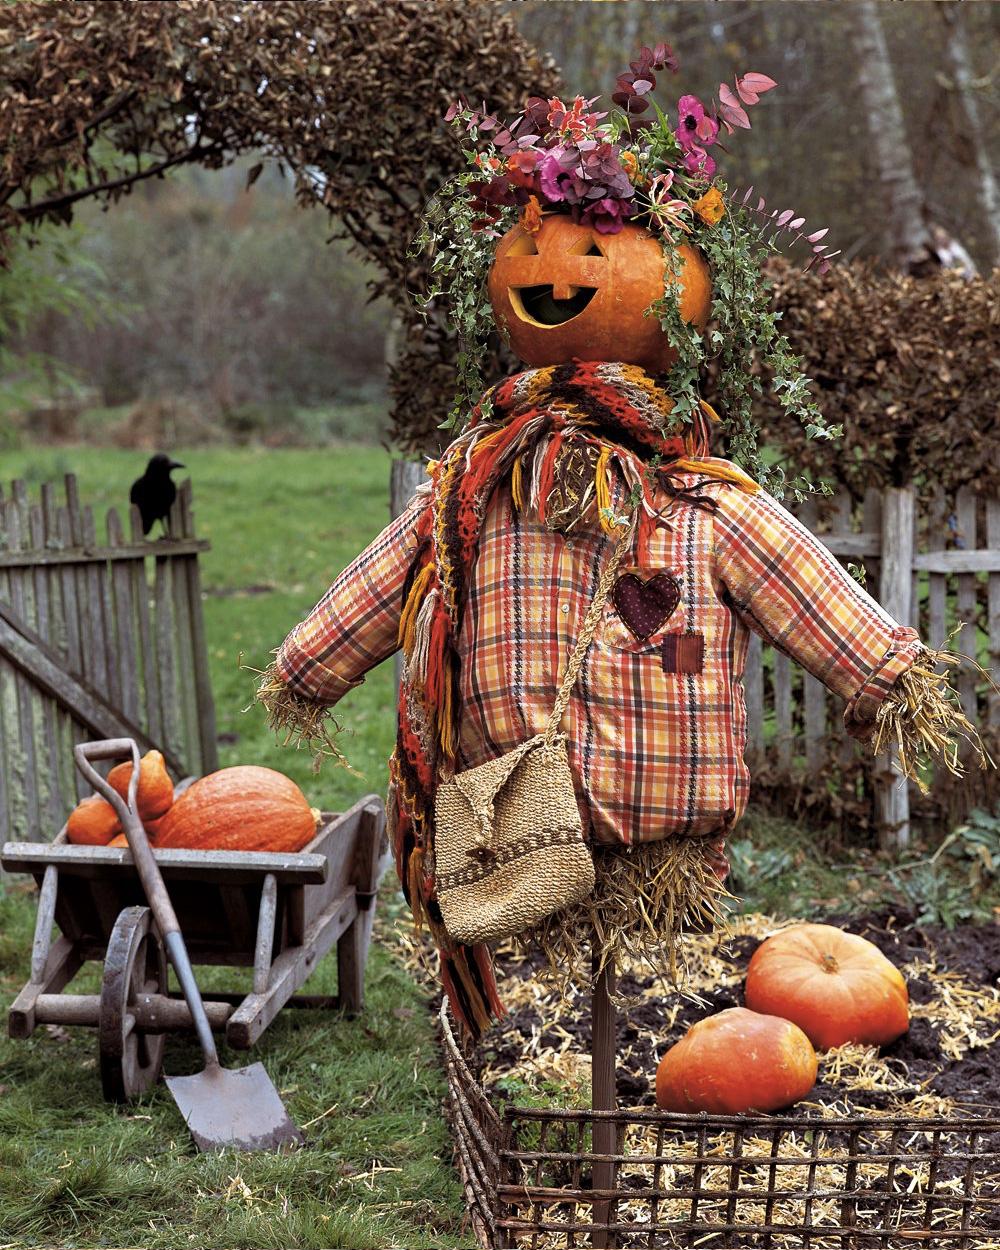 Un Jardin Décoré Pour Halloween | Shake My Blog intérieur Deco Jardin Halloween